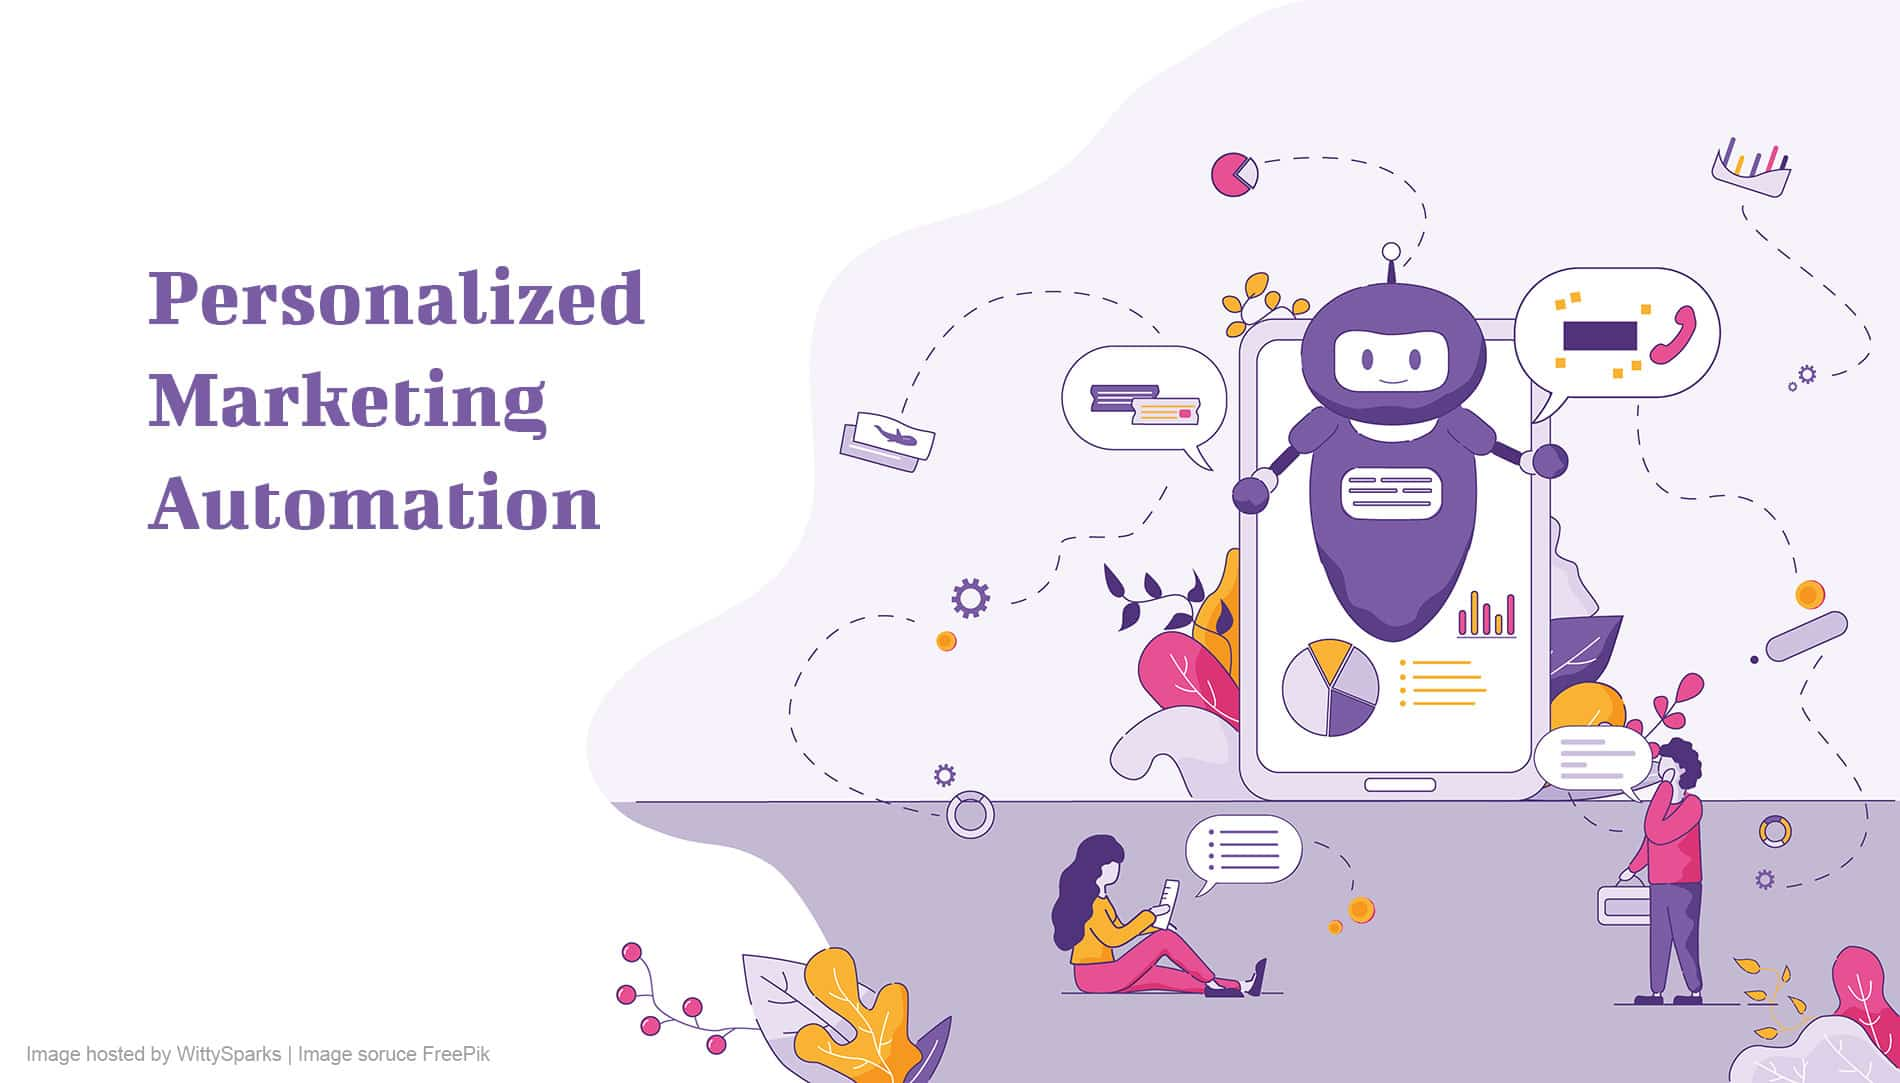 Personalized Marketing Automation